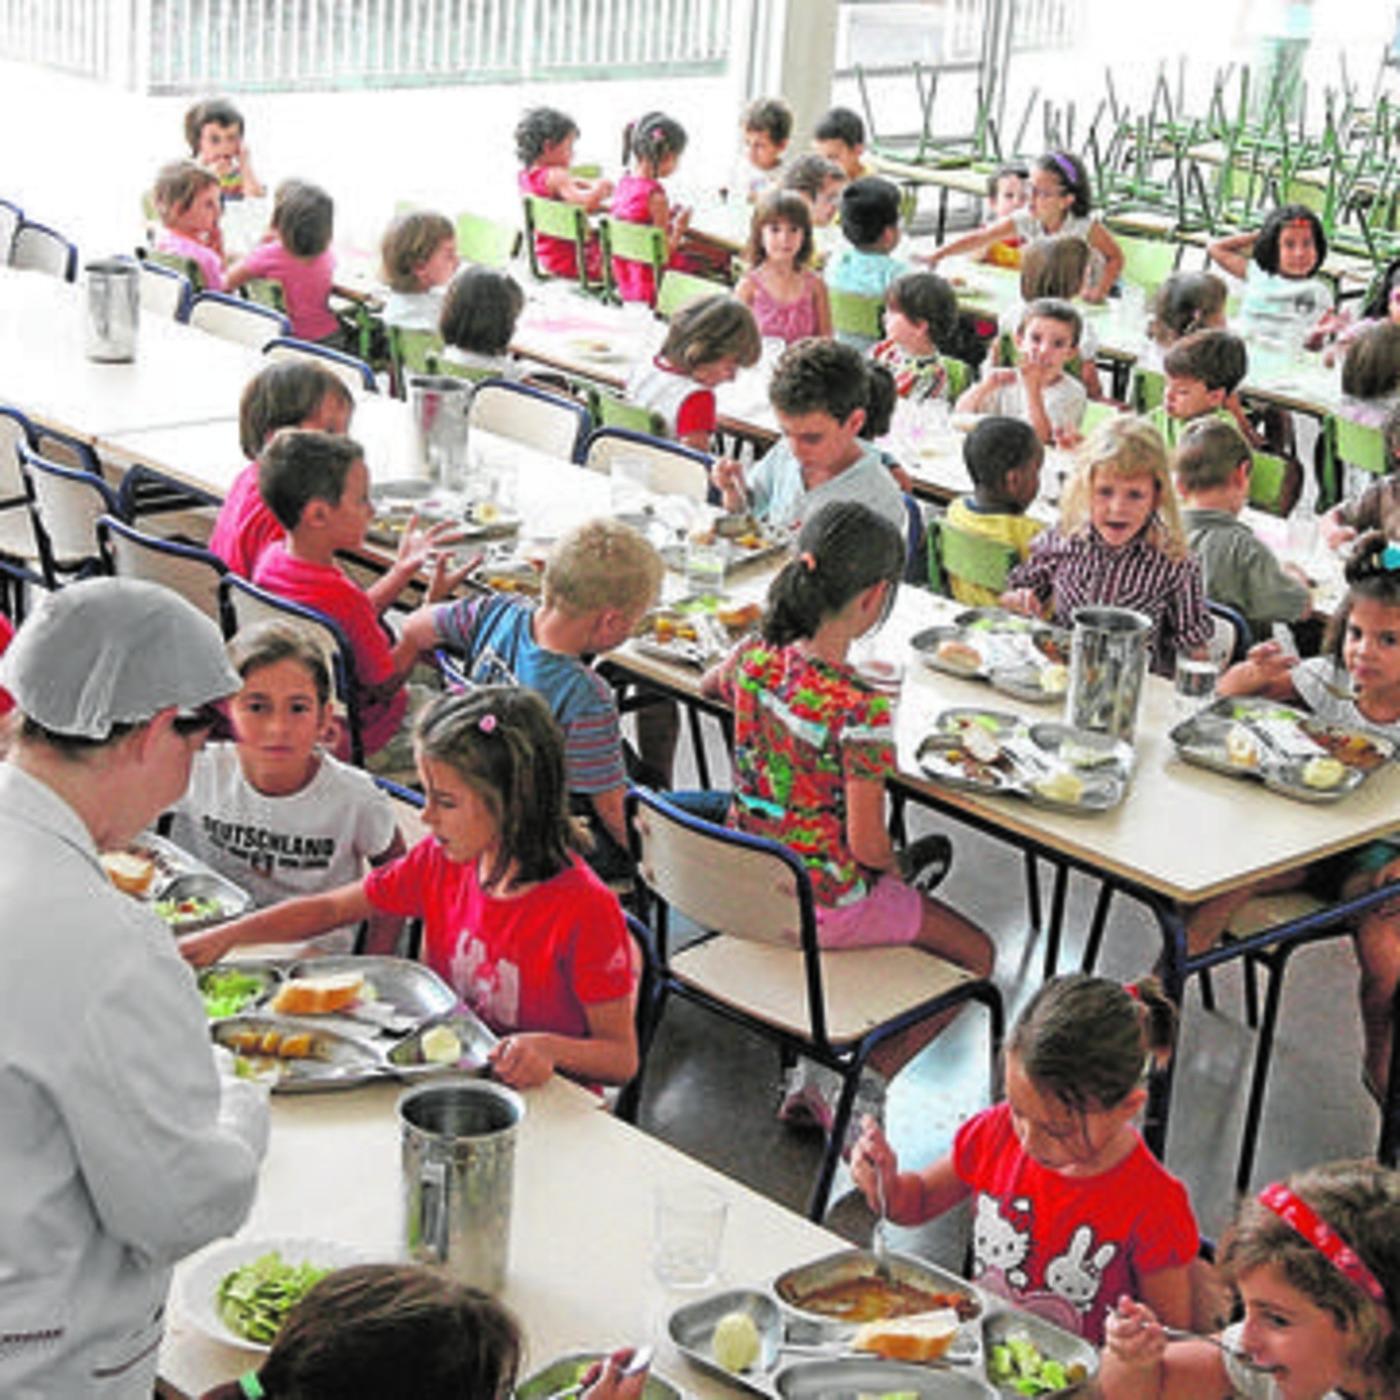 Paisaje sonoro comedor escolar en valencia en creaci n - Comedor escolar en ingles ...